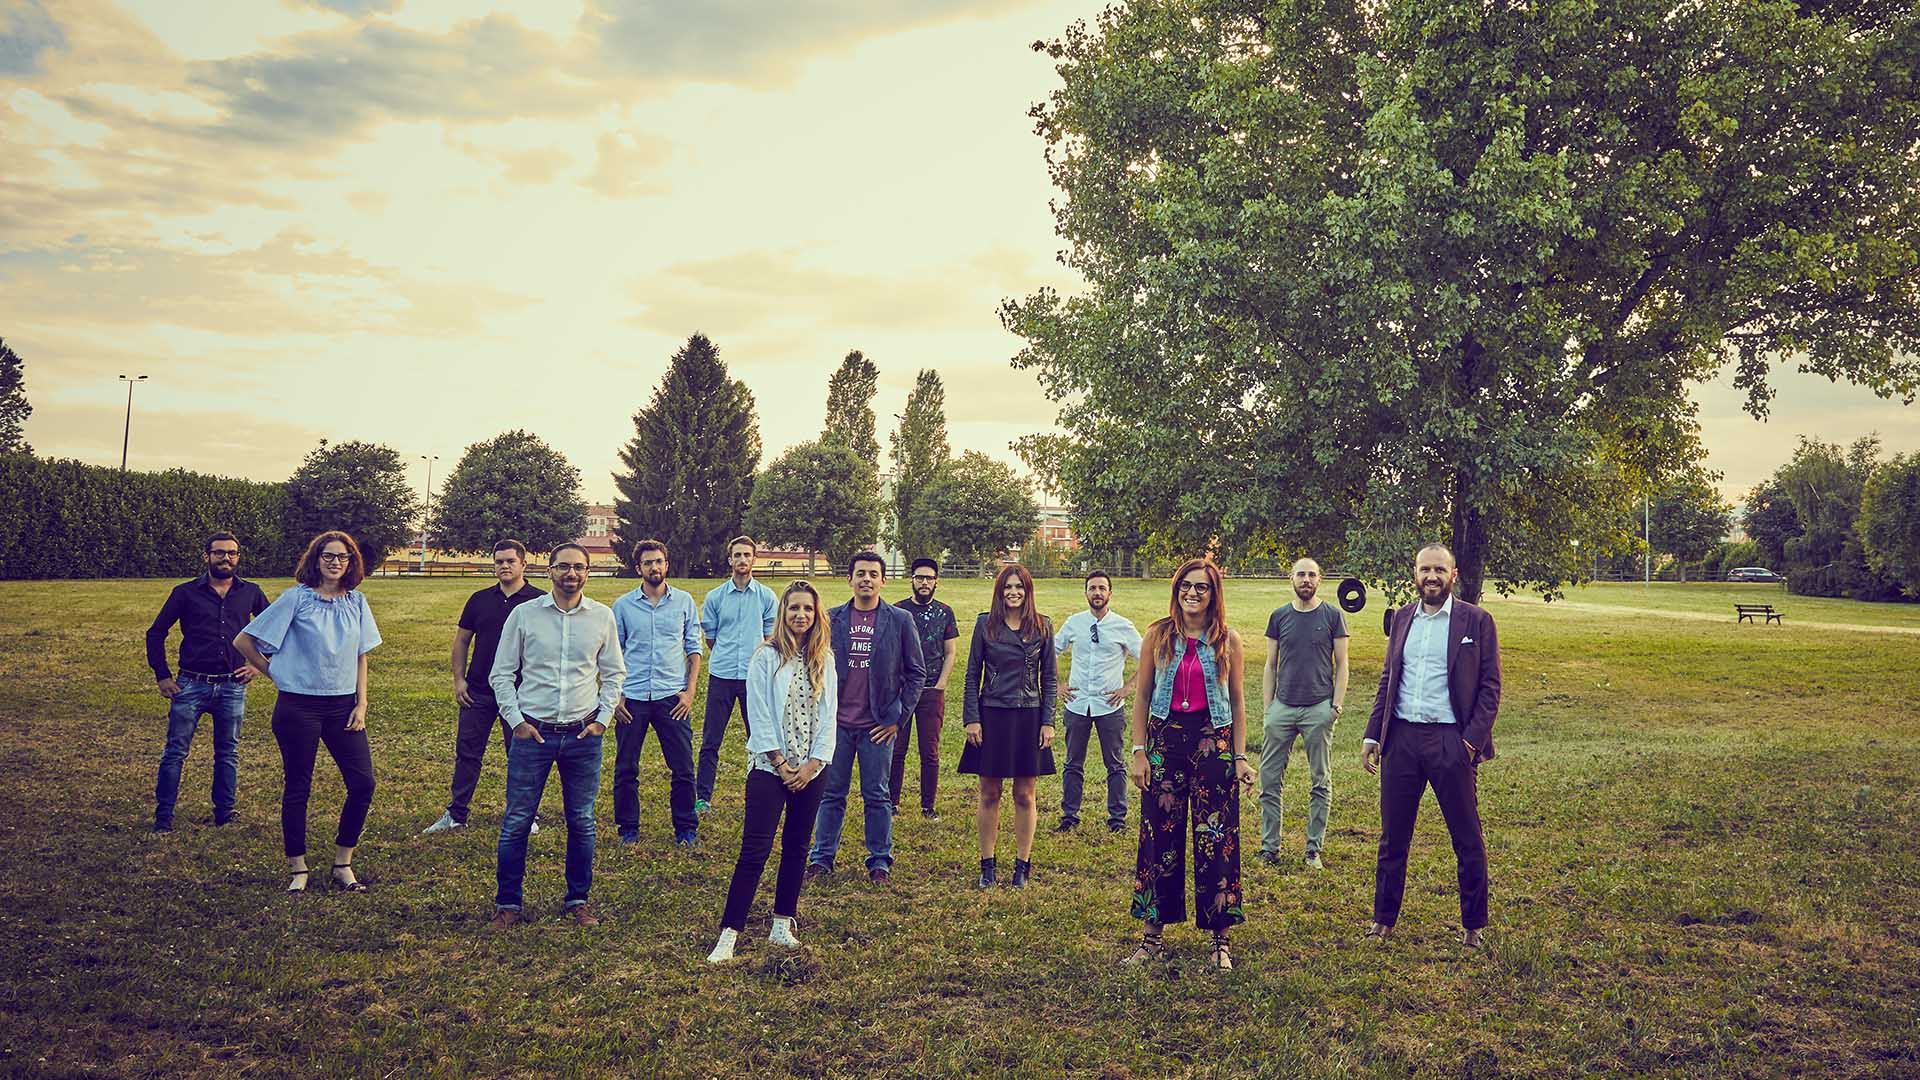 btrees team 2018